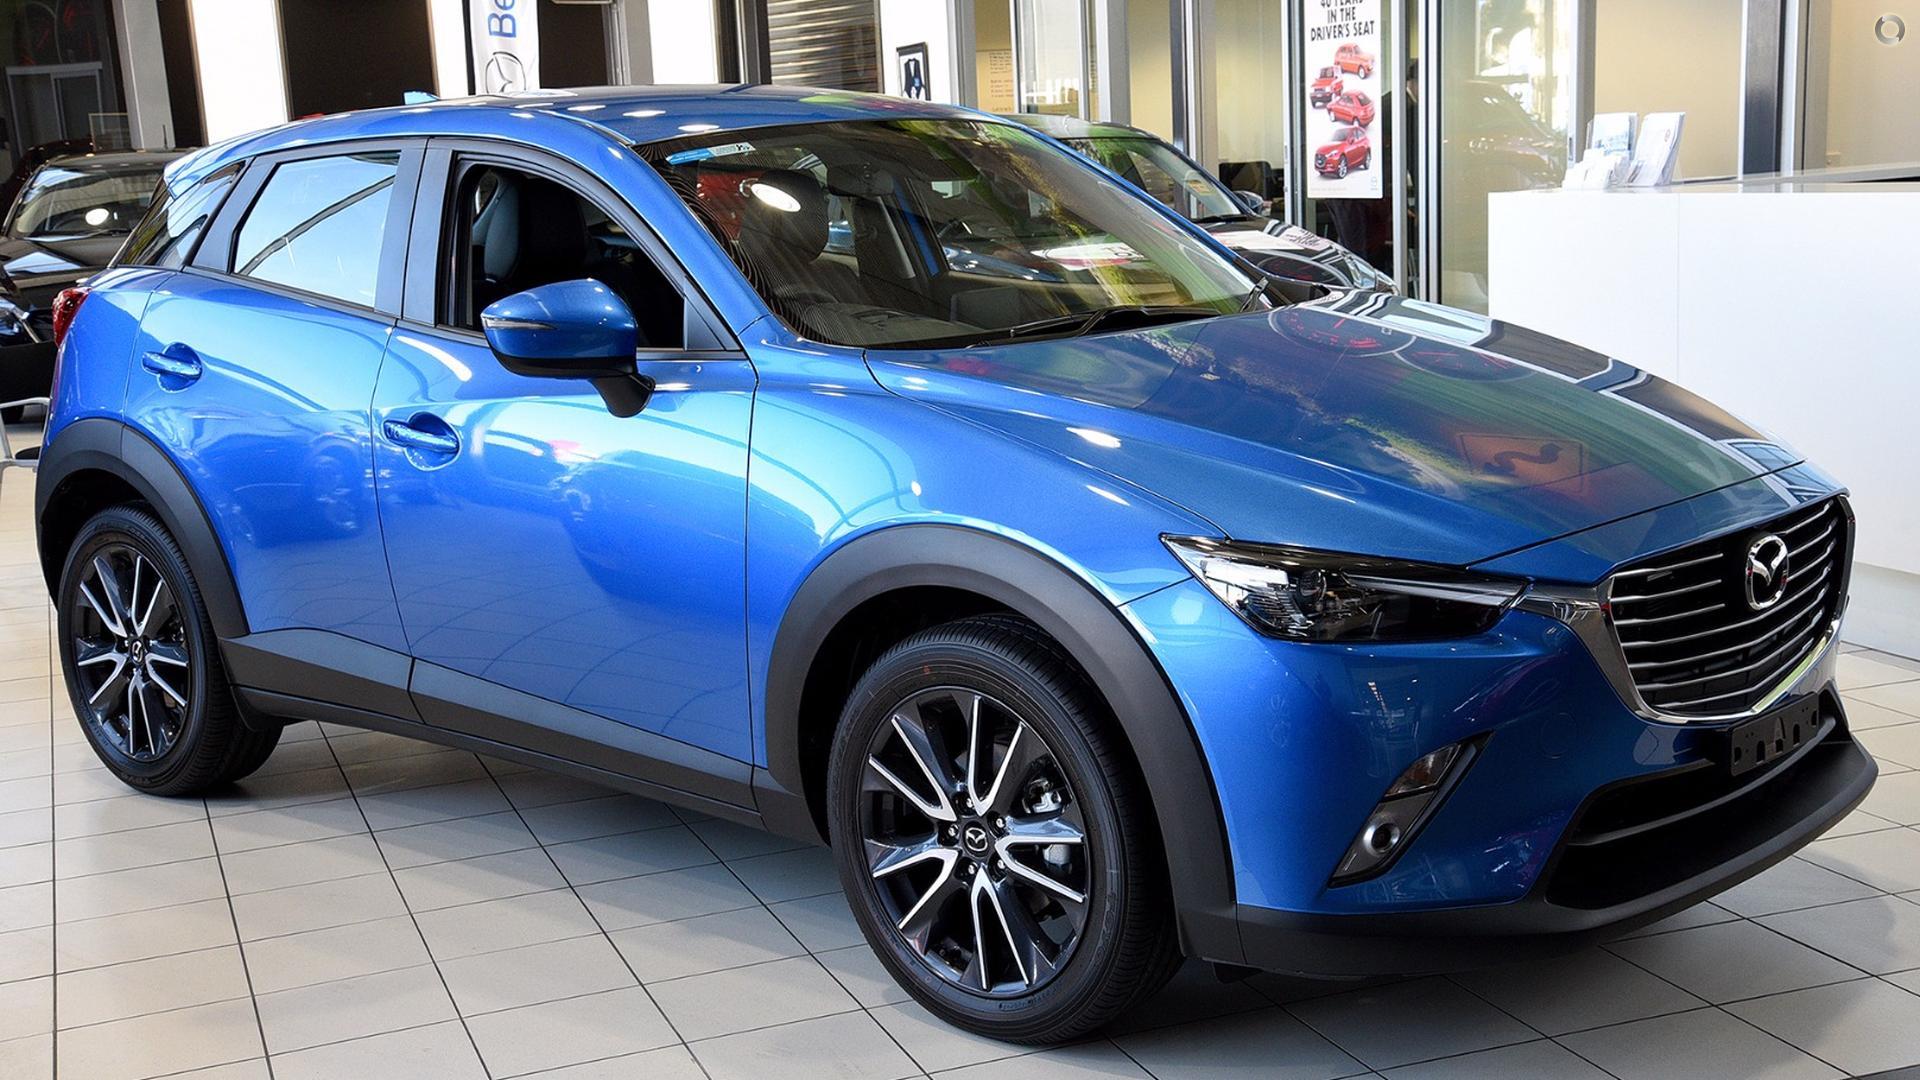 2018 Mazda CX-3 DK